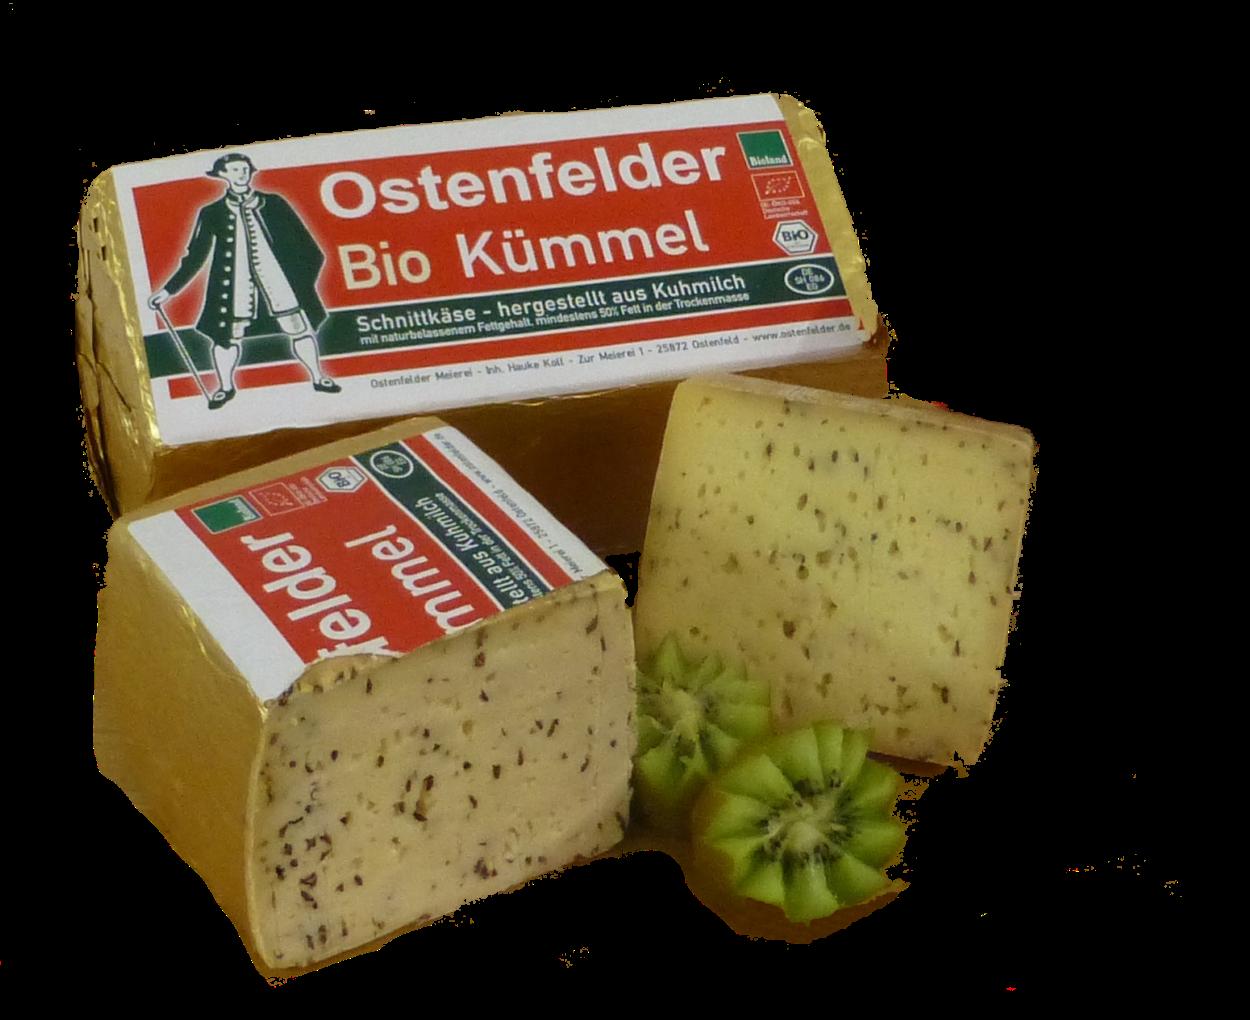 Ostenfelder Bio-Tilsiter mit Kümmel